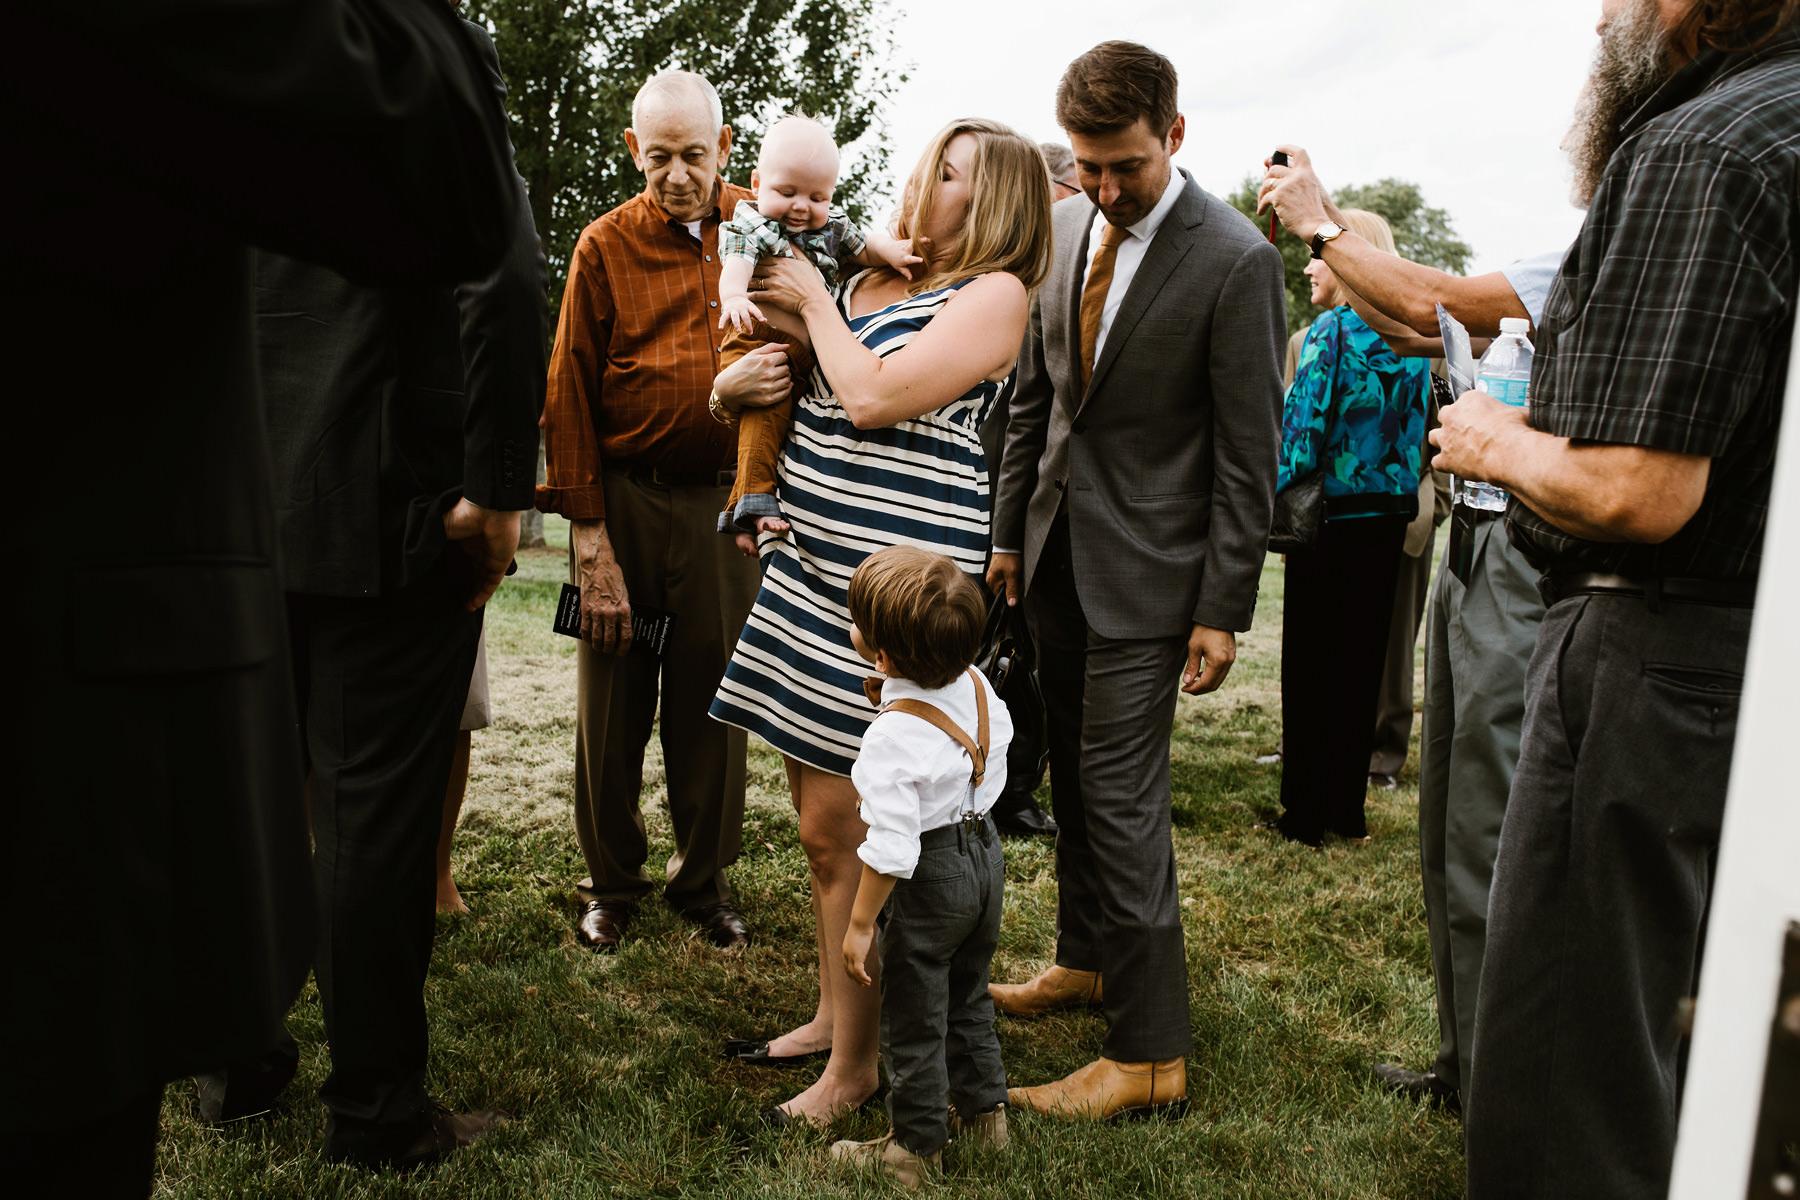 Alldredge Orchard Kansas City_Kindling Wedding Photography BLOG 49.JPG